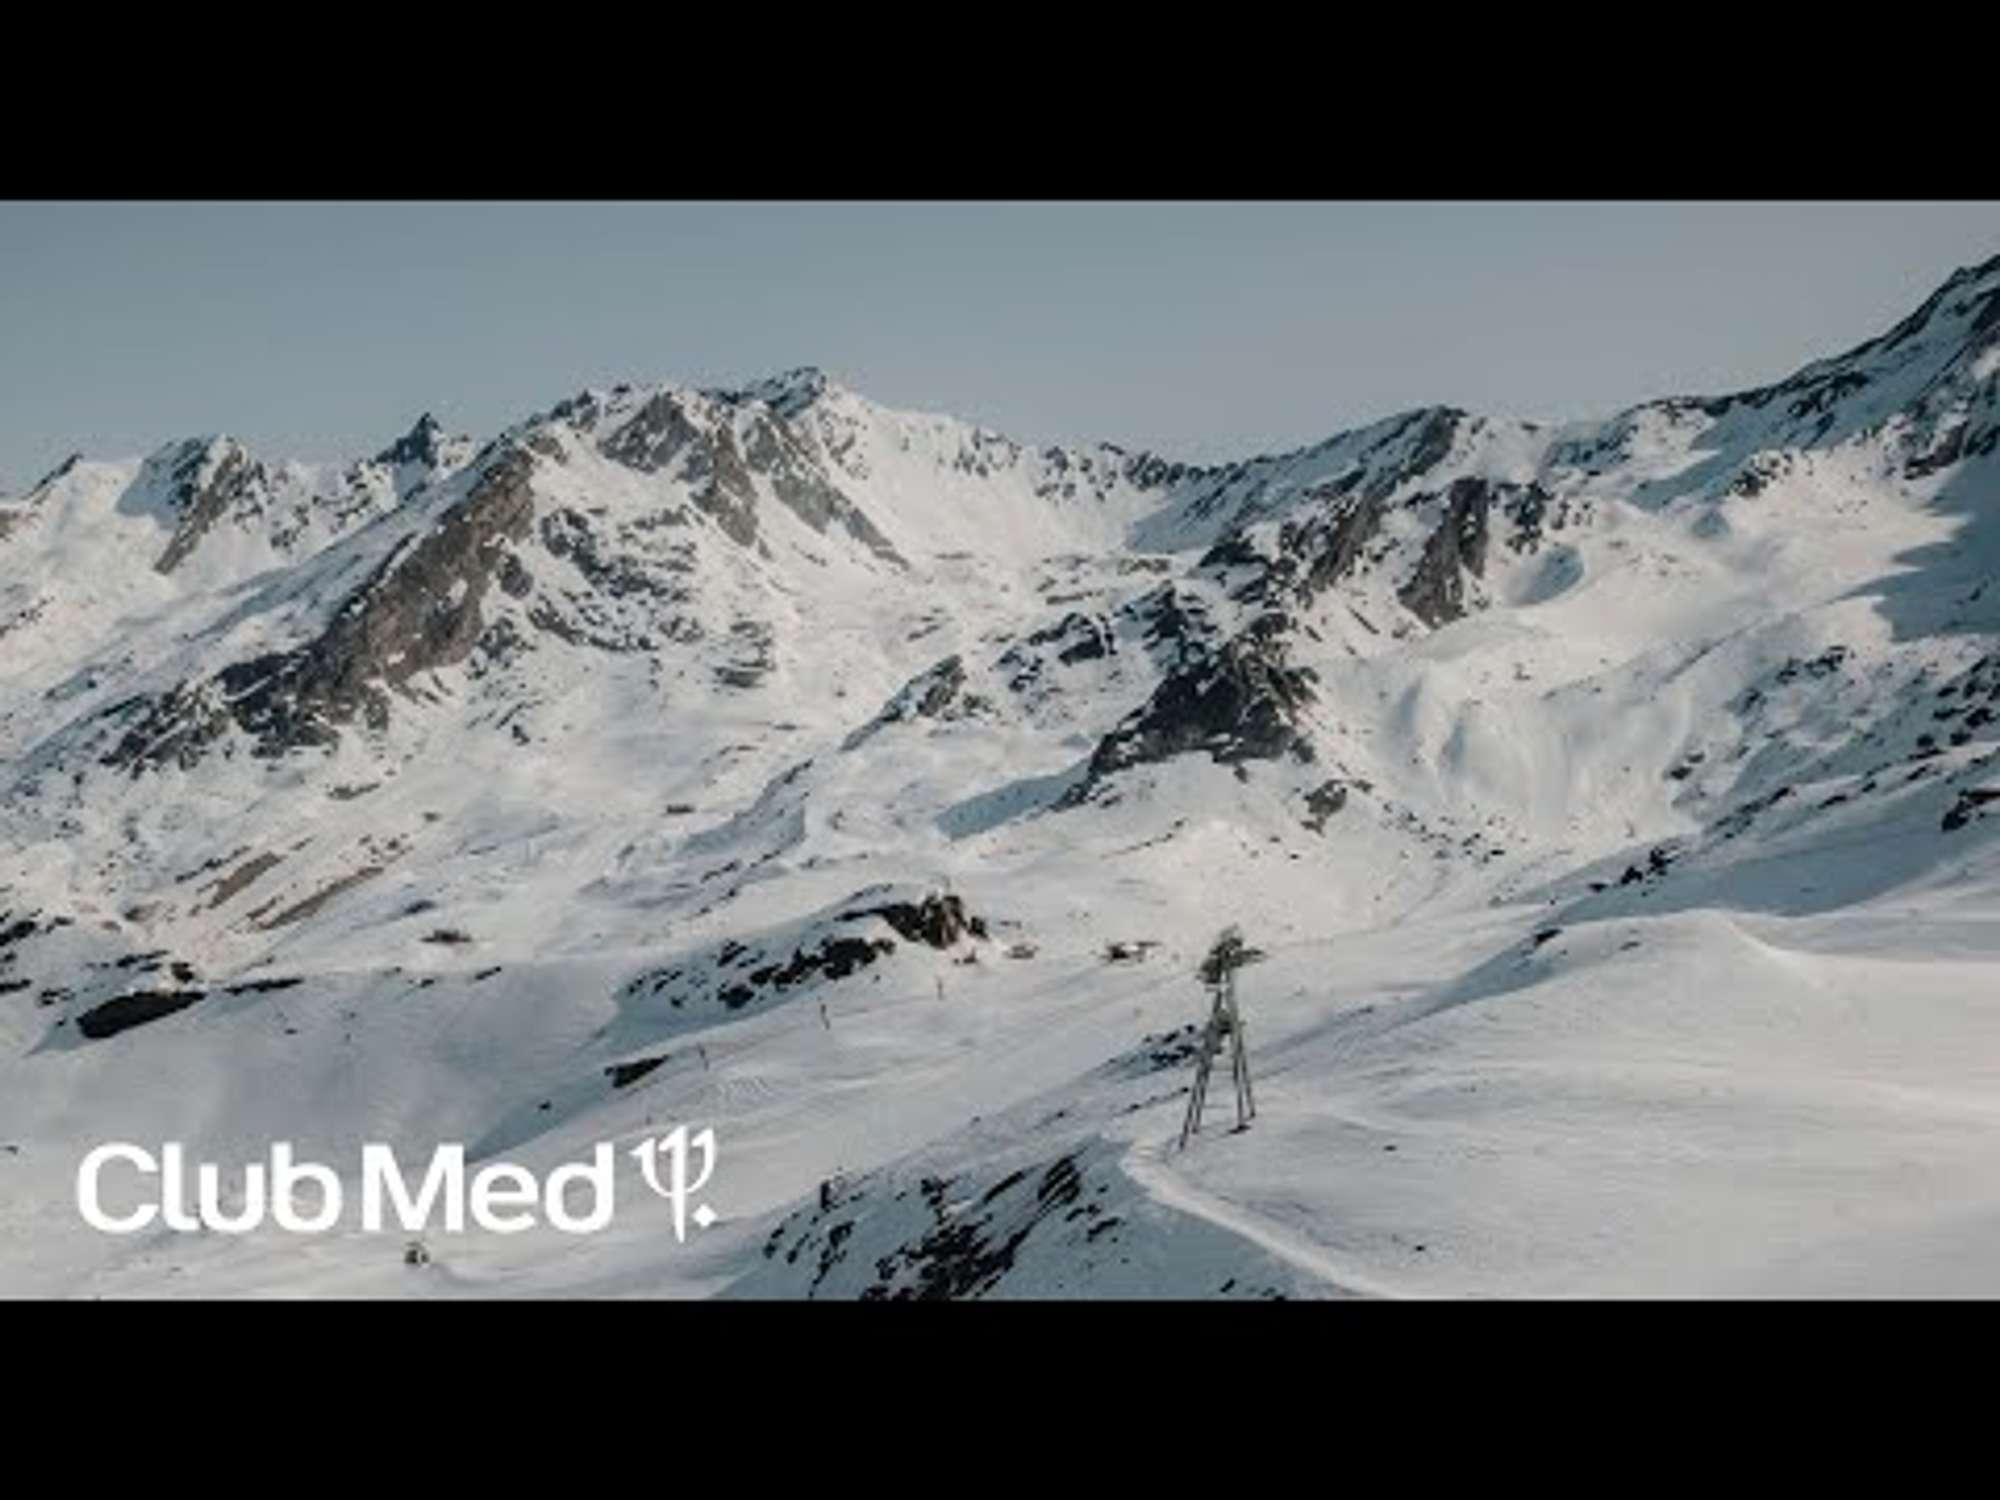 Open Val Thorens Sensations וידיאו slideshow gallery at 1